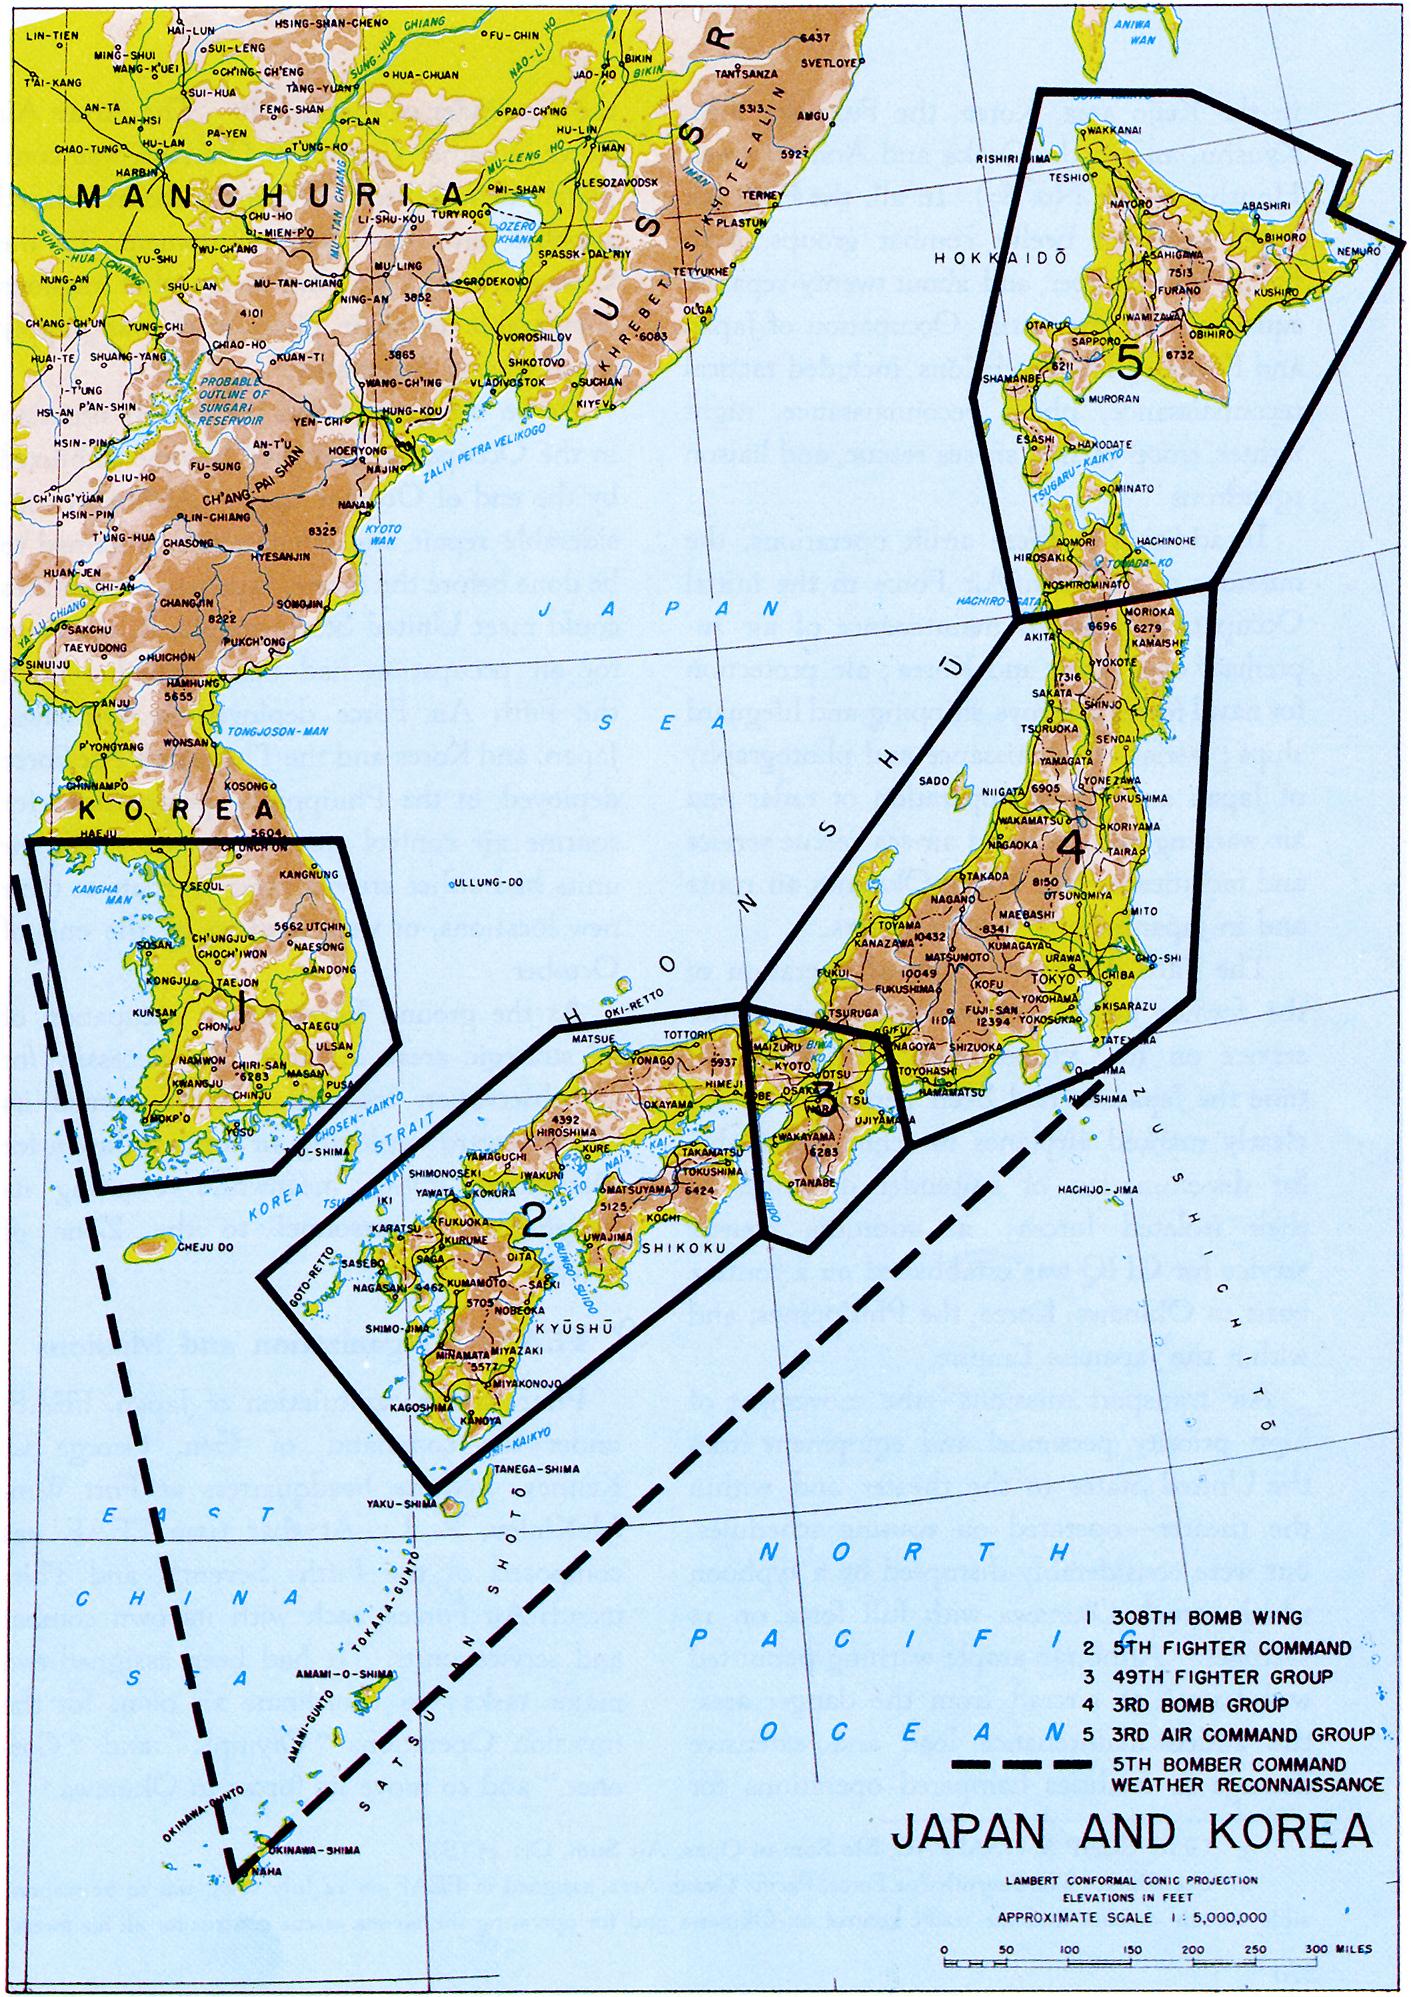 Fifth_U.S._Air_Force_Zones_of_Responsibility%2C_1945-1947.jpg